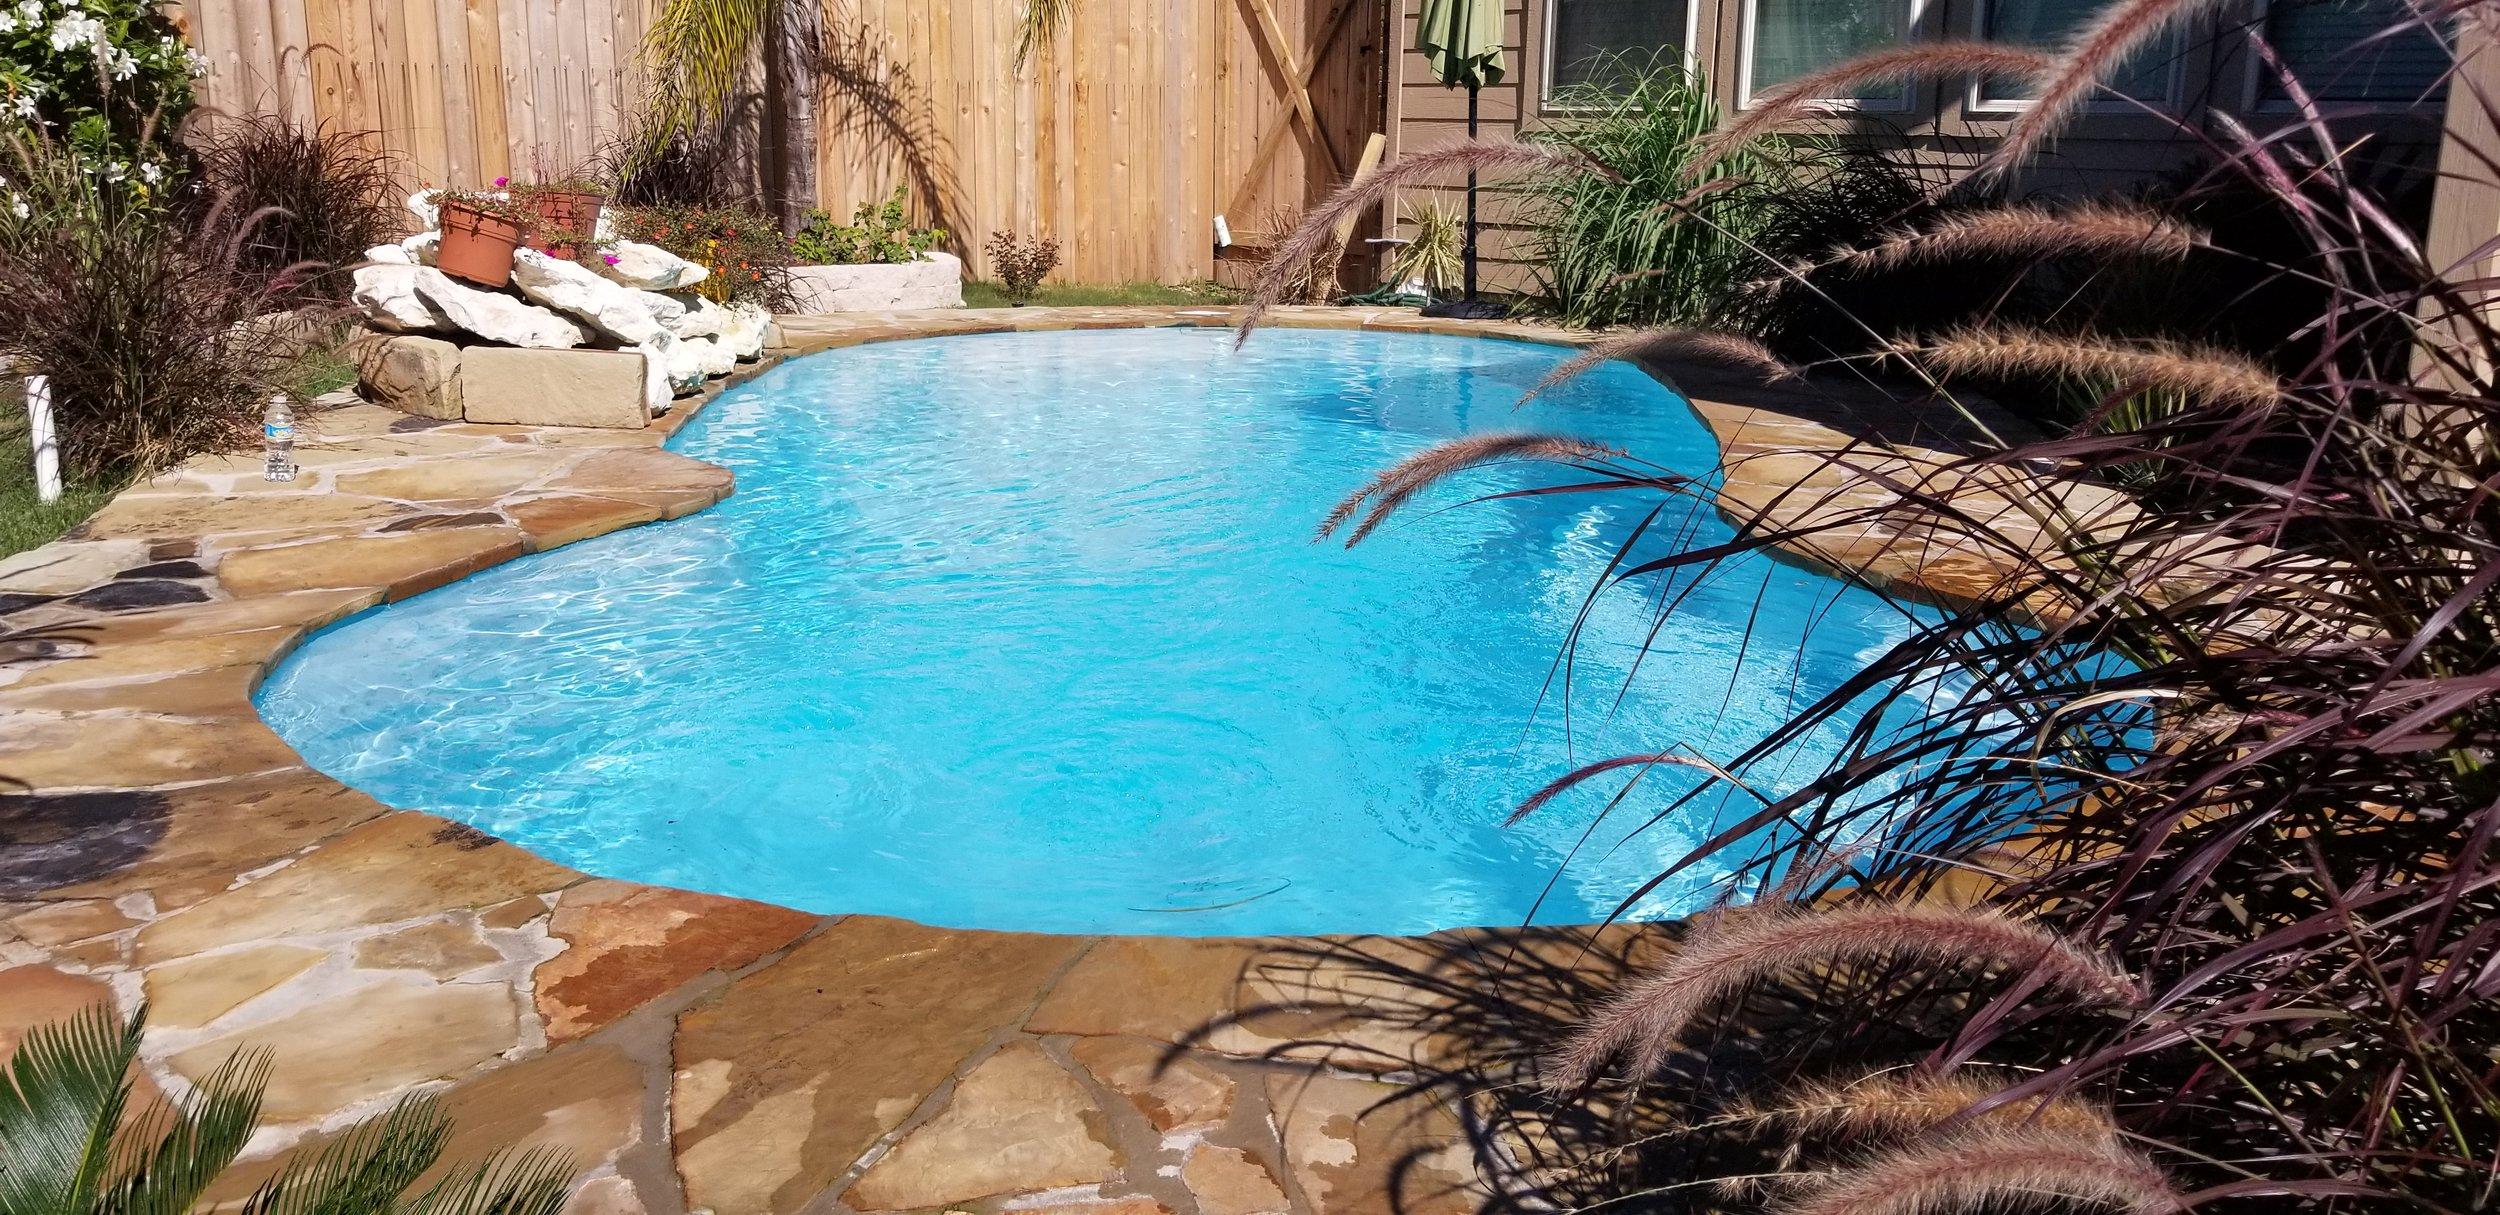 gary s pool and patio